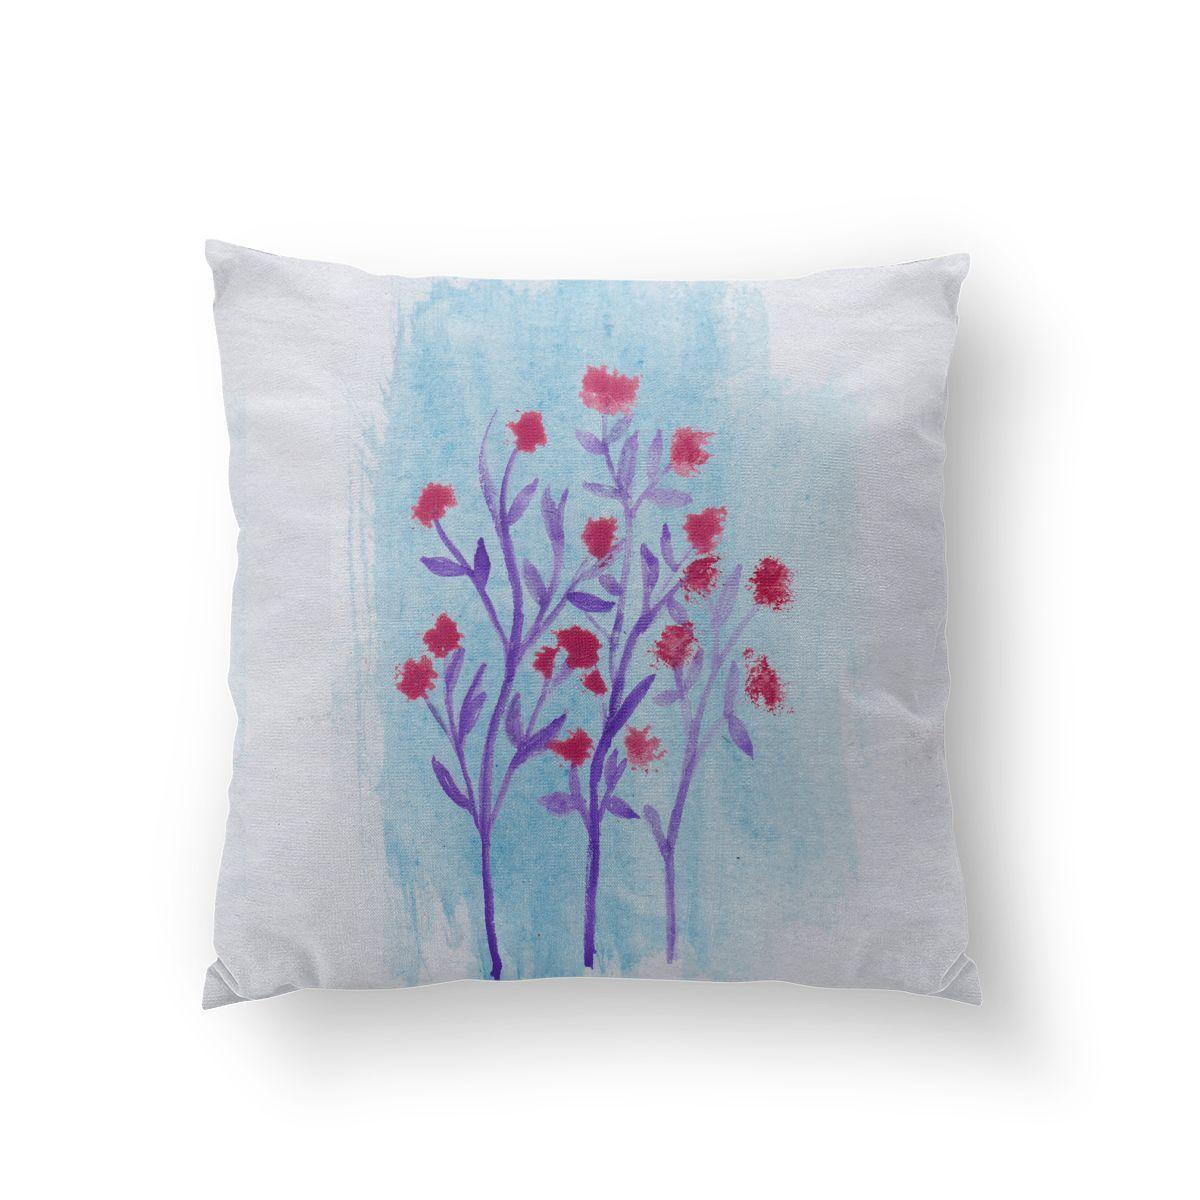 on gallery pillow best ever imgur album